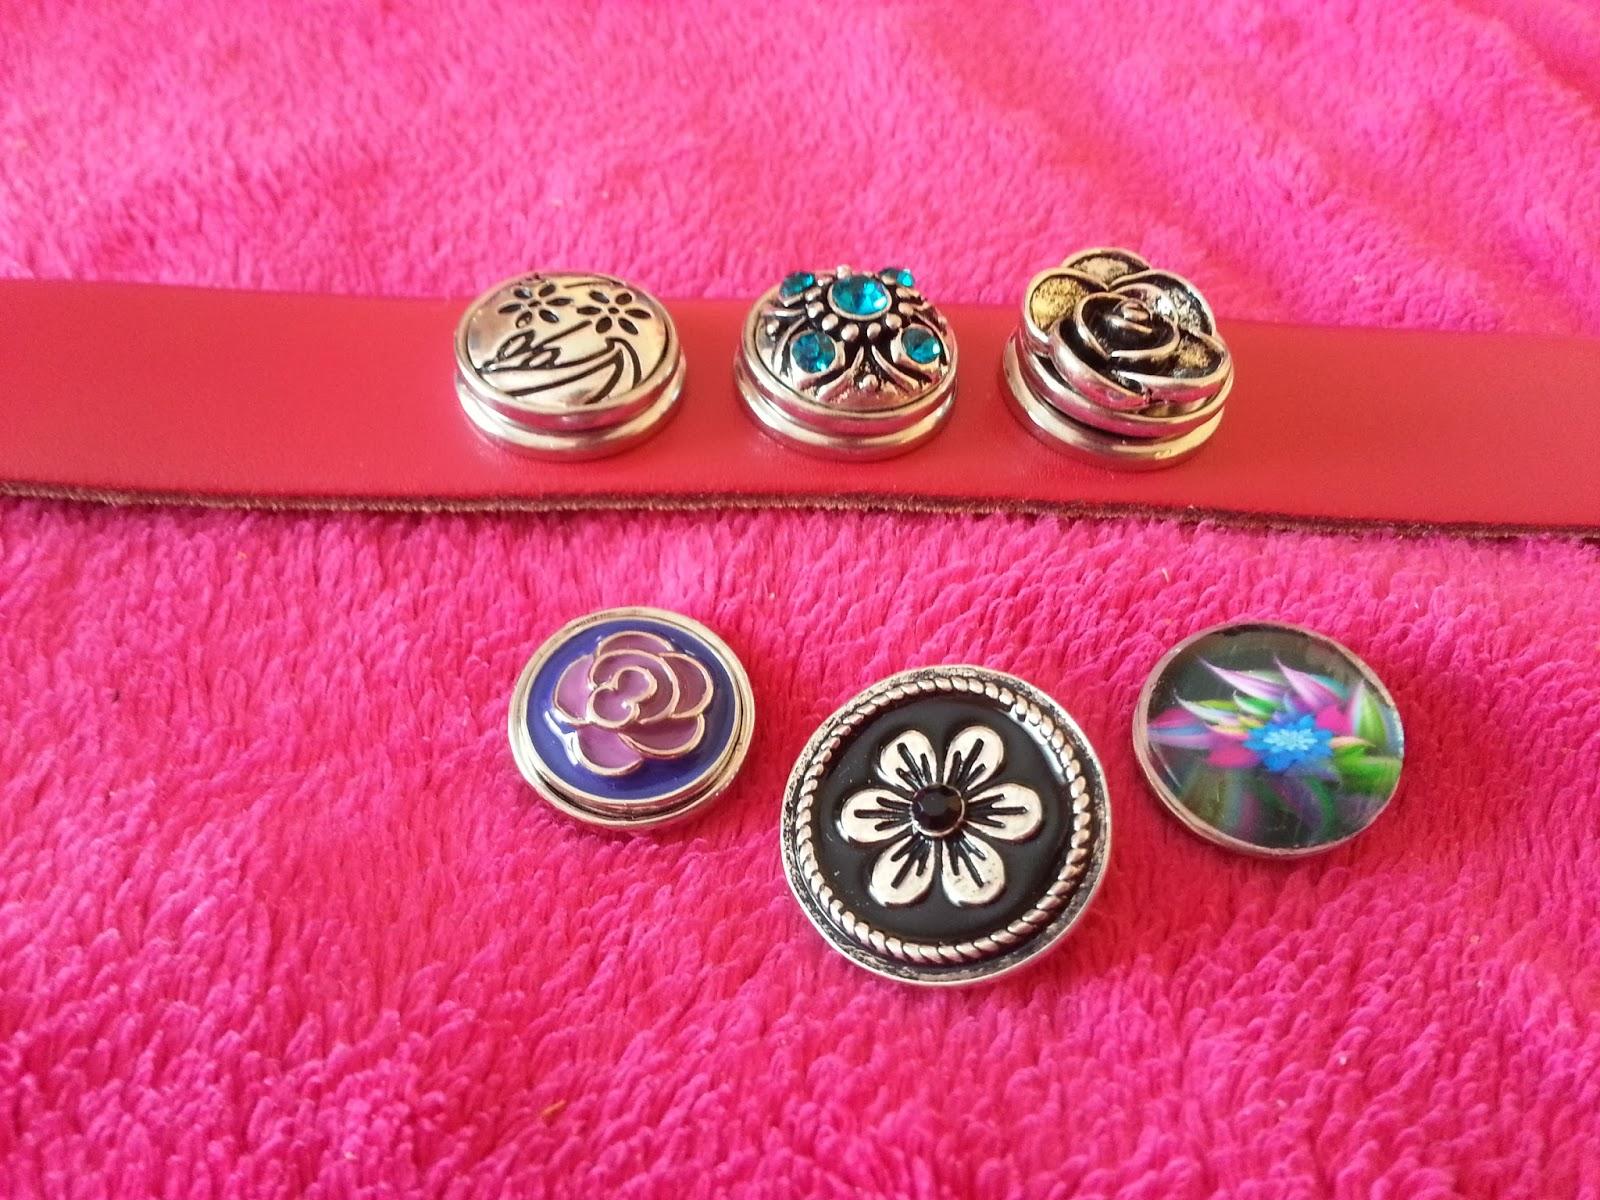 arm candy, bracelets, button jewels, chuck chucks, chuck-chucks, gems, interchangeable jewelry, jewelry, review on chuck chucks,